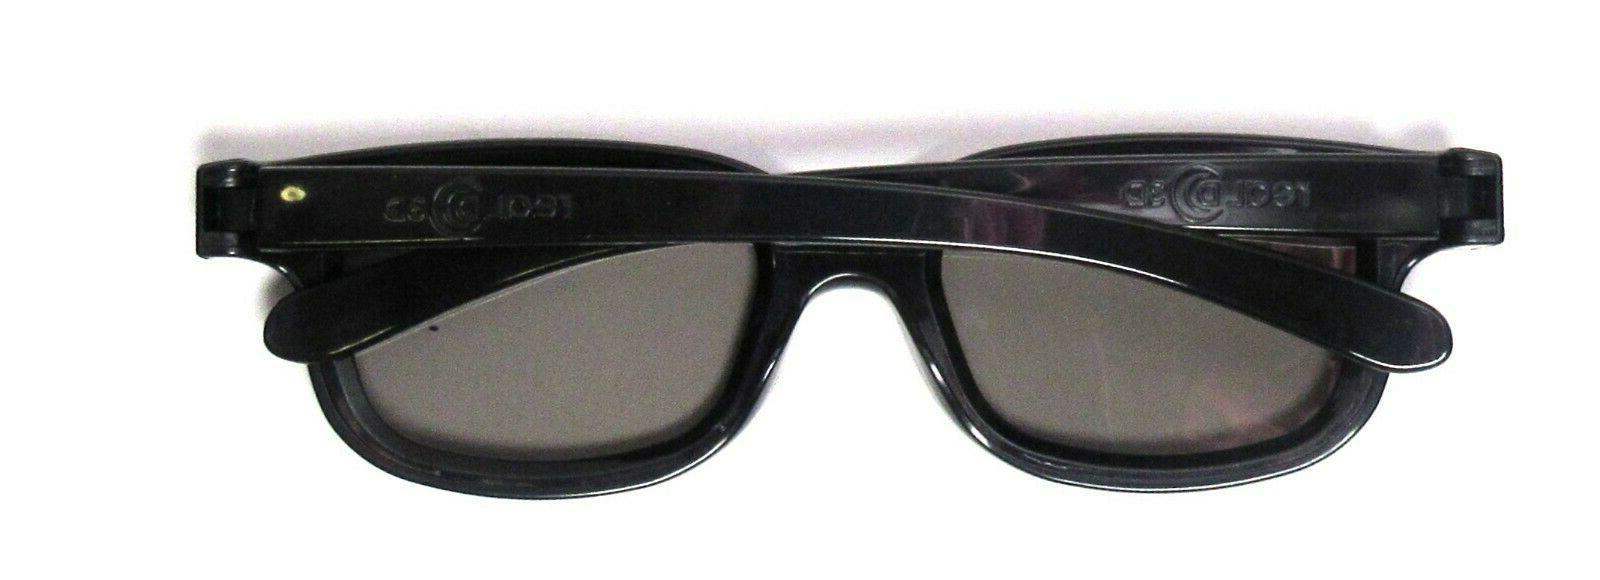 3D Glasses Adult Size >NEW< 3d TVs<<<